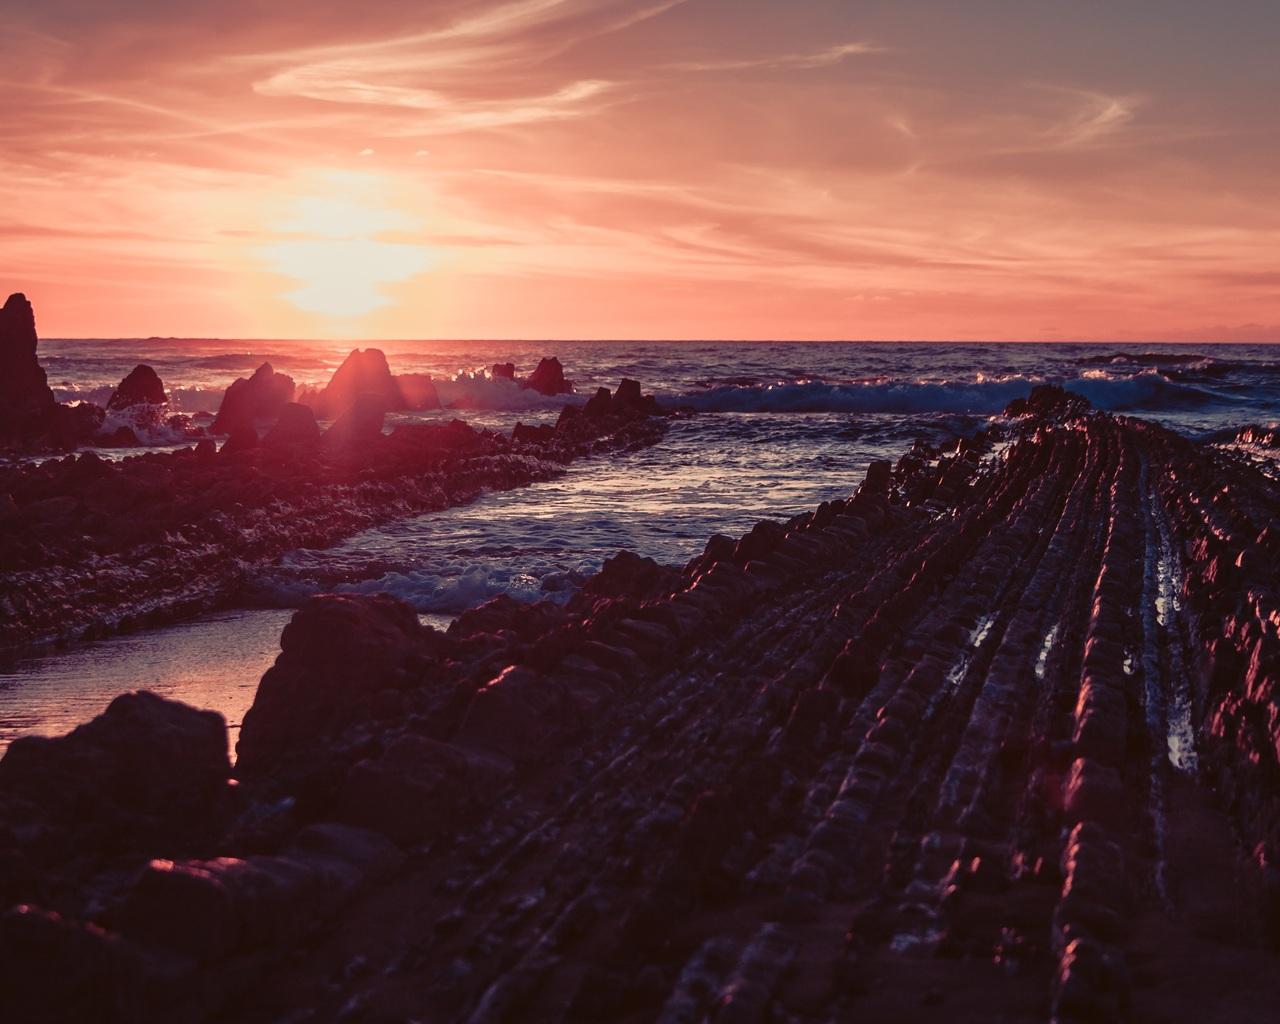 summer-sunset-sea-water-4k-k5.jpg